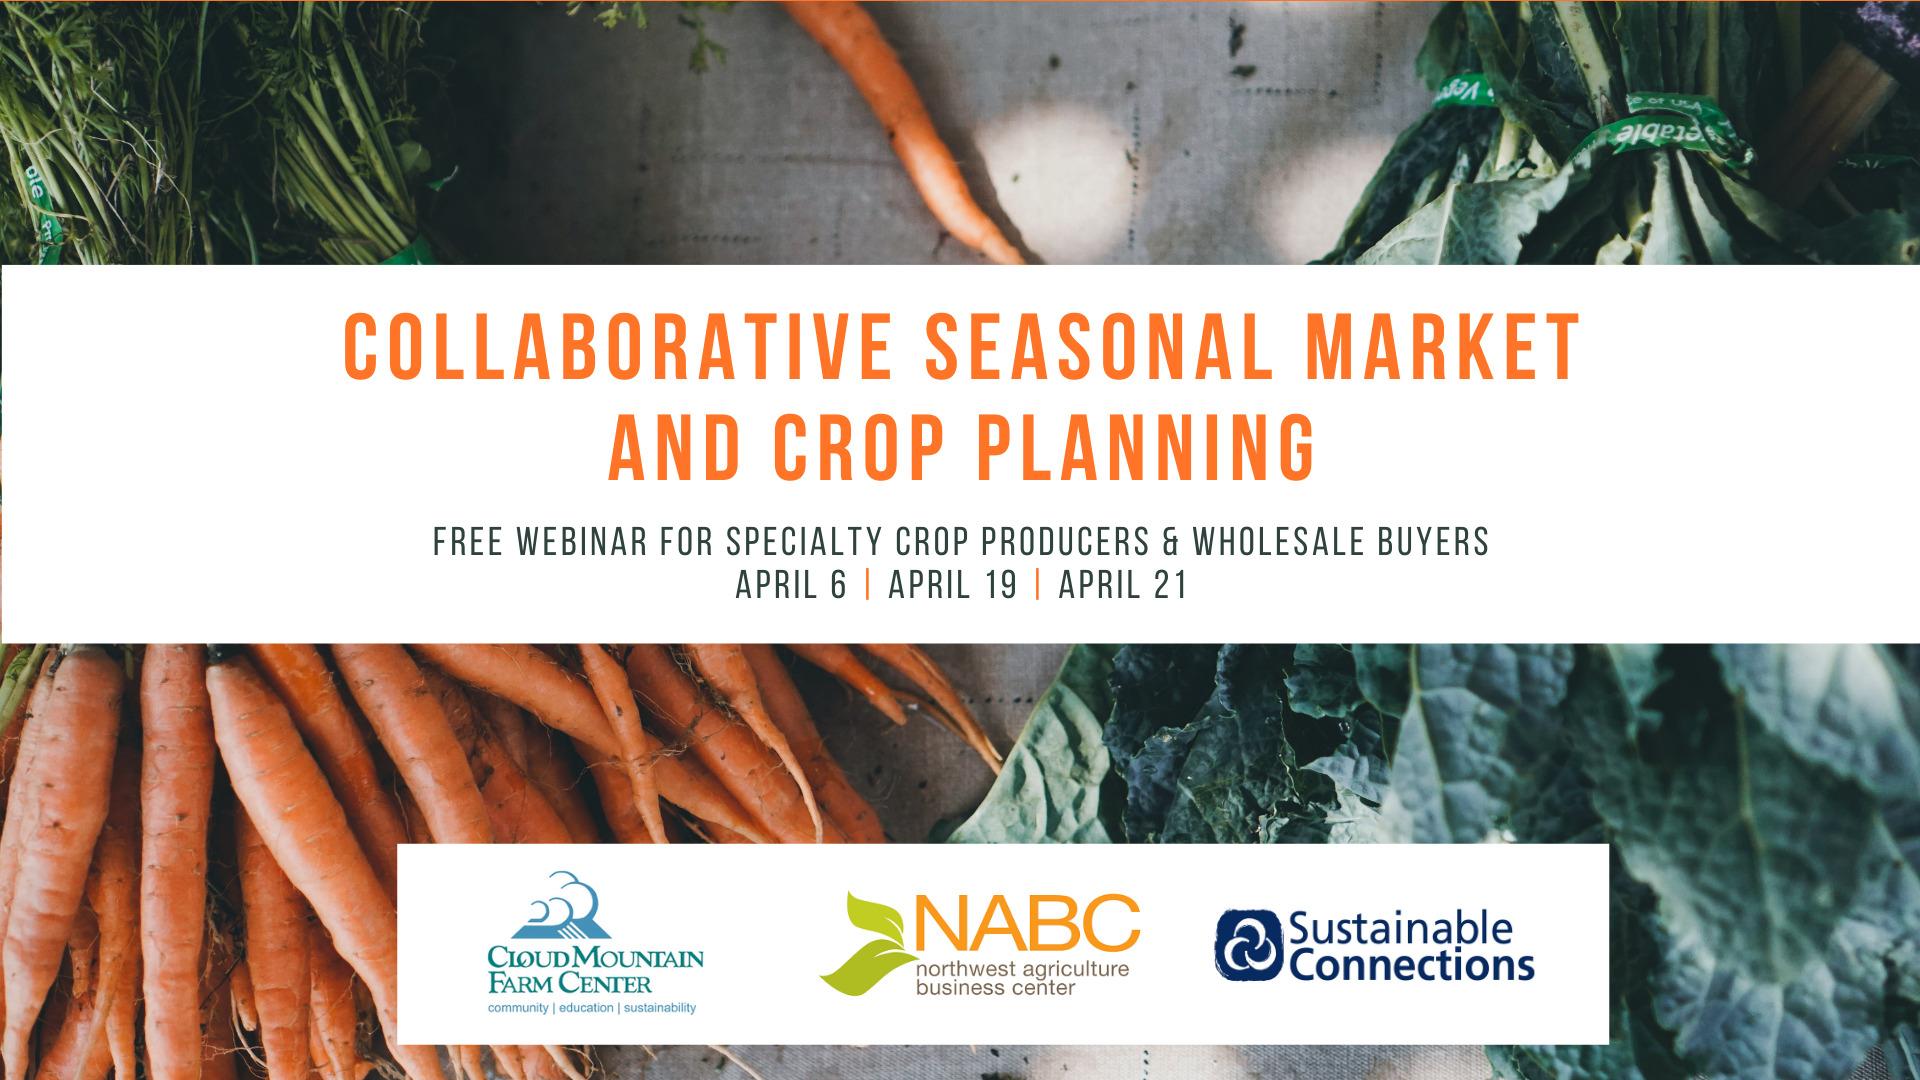 Collaborative Seasonal Market and Crop Planning